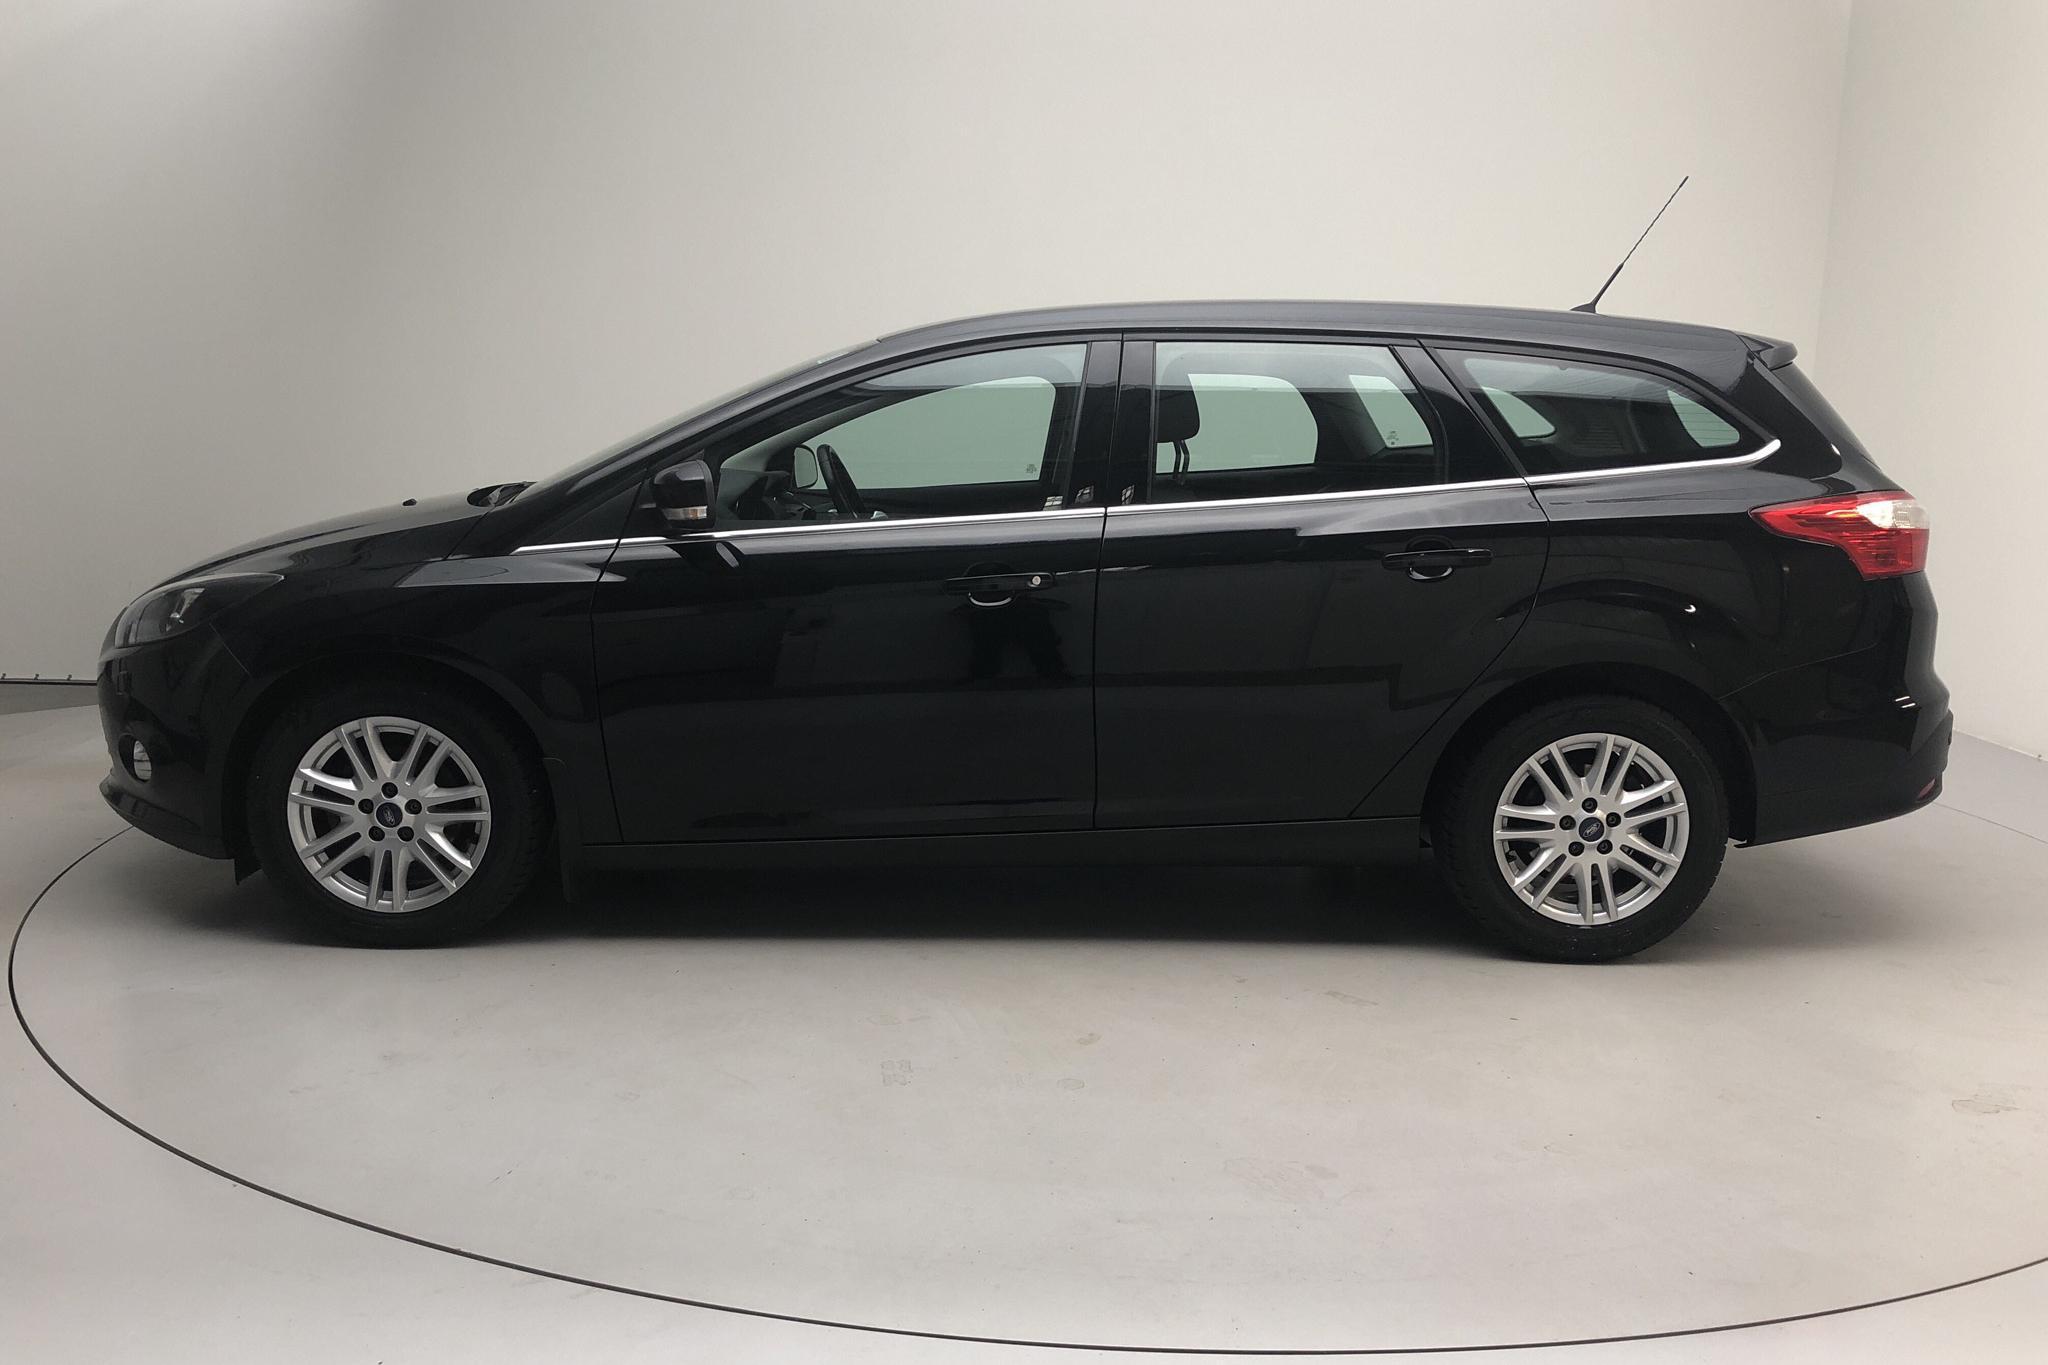 Ford Focus 1.0 EcoBoost Kombi (125hk) - 100 420 km - Manual - black - 2014